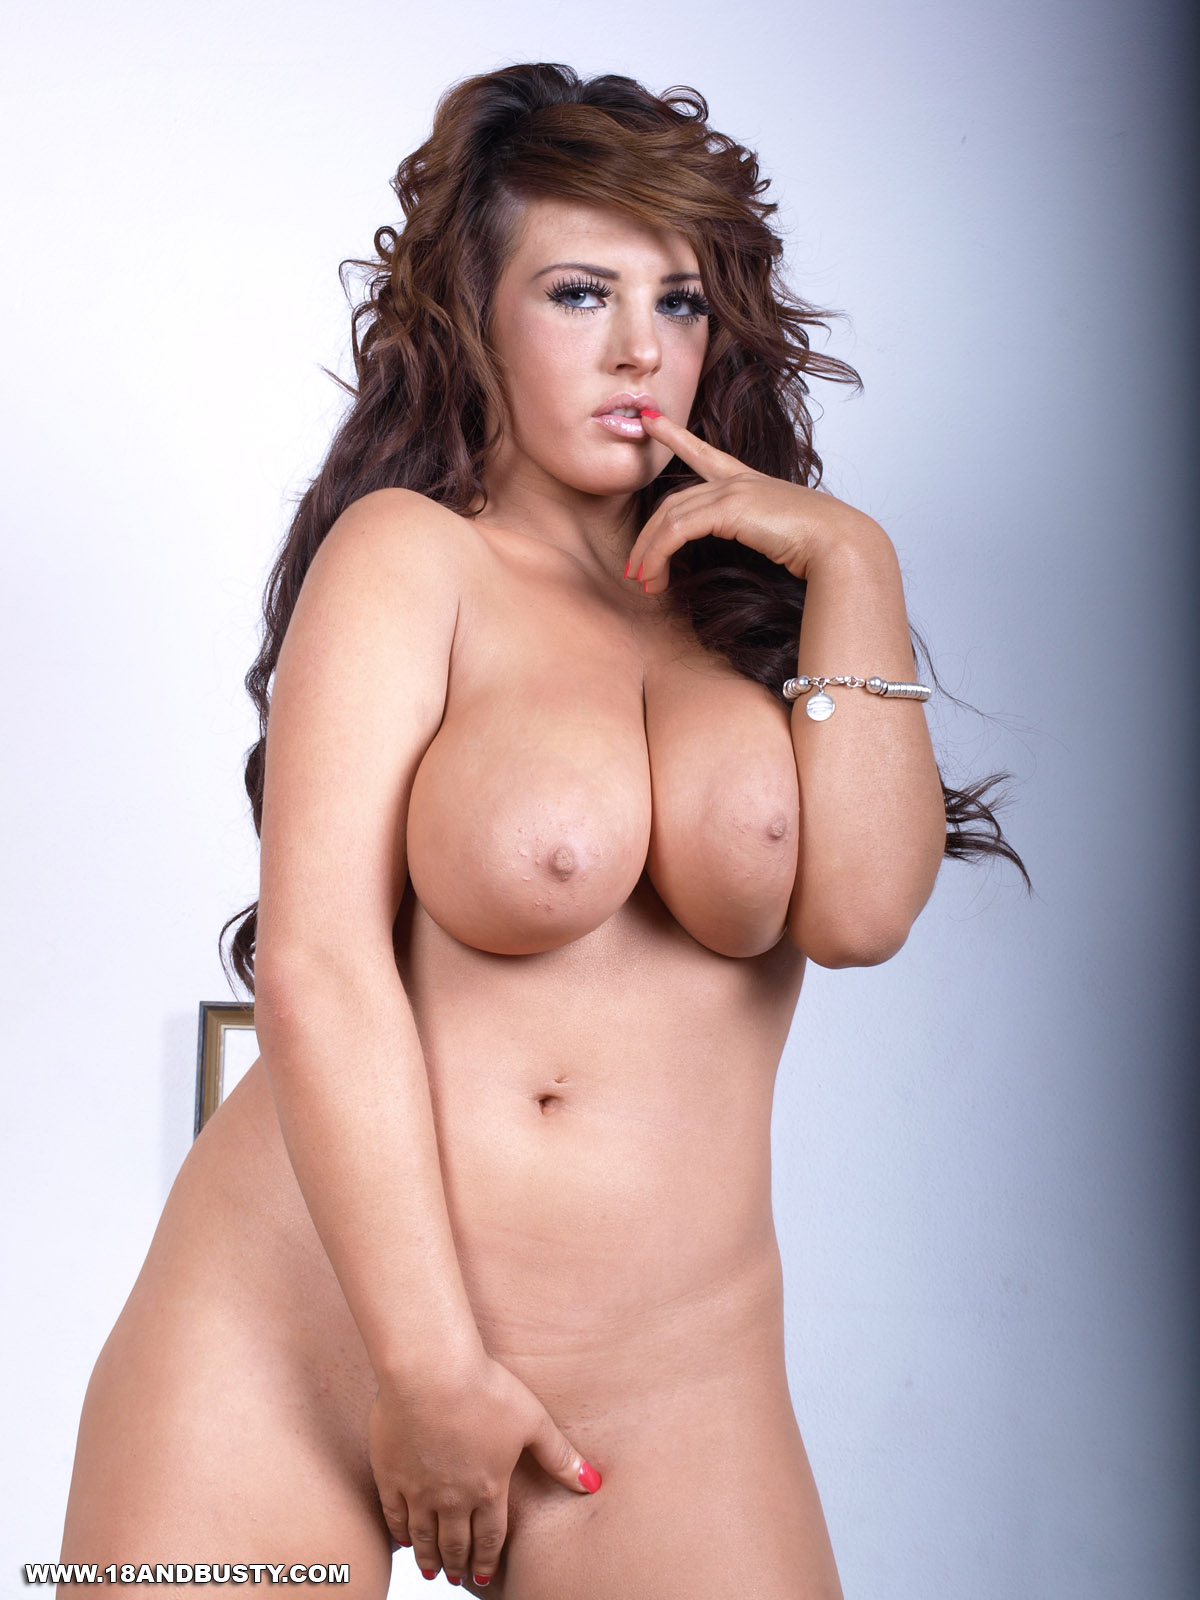 Onlyallsites robyn j foto stockings open pussy xxx porn pics